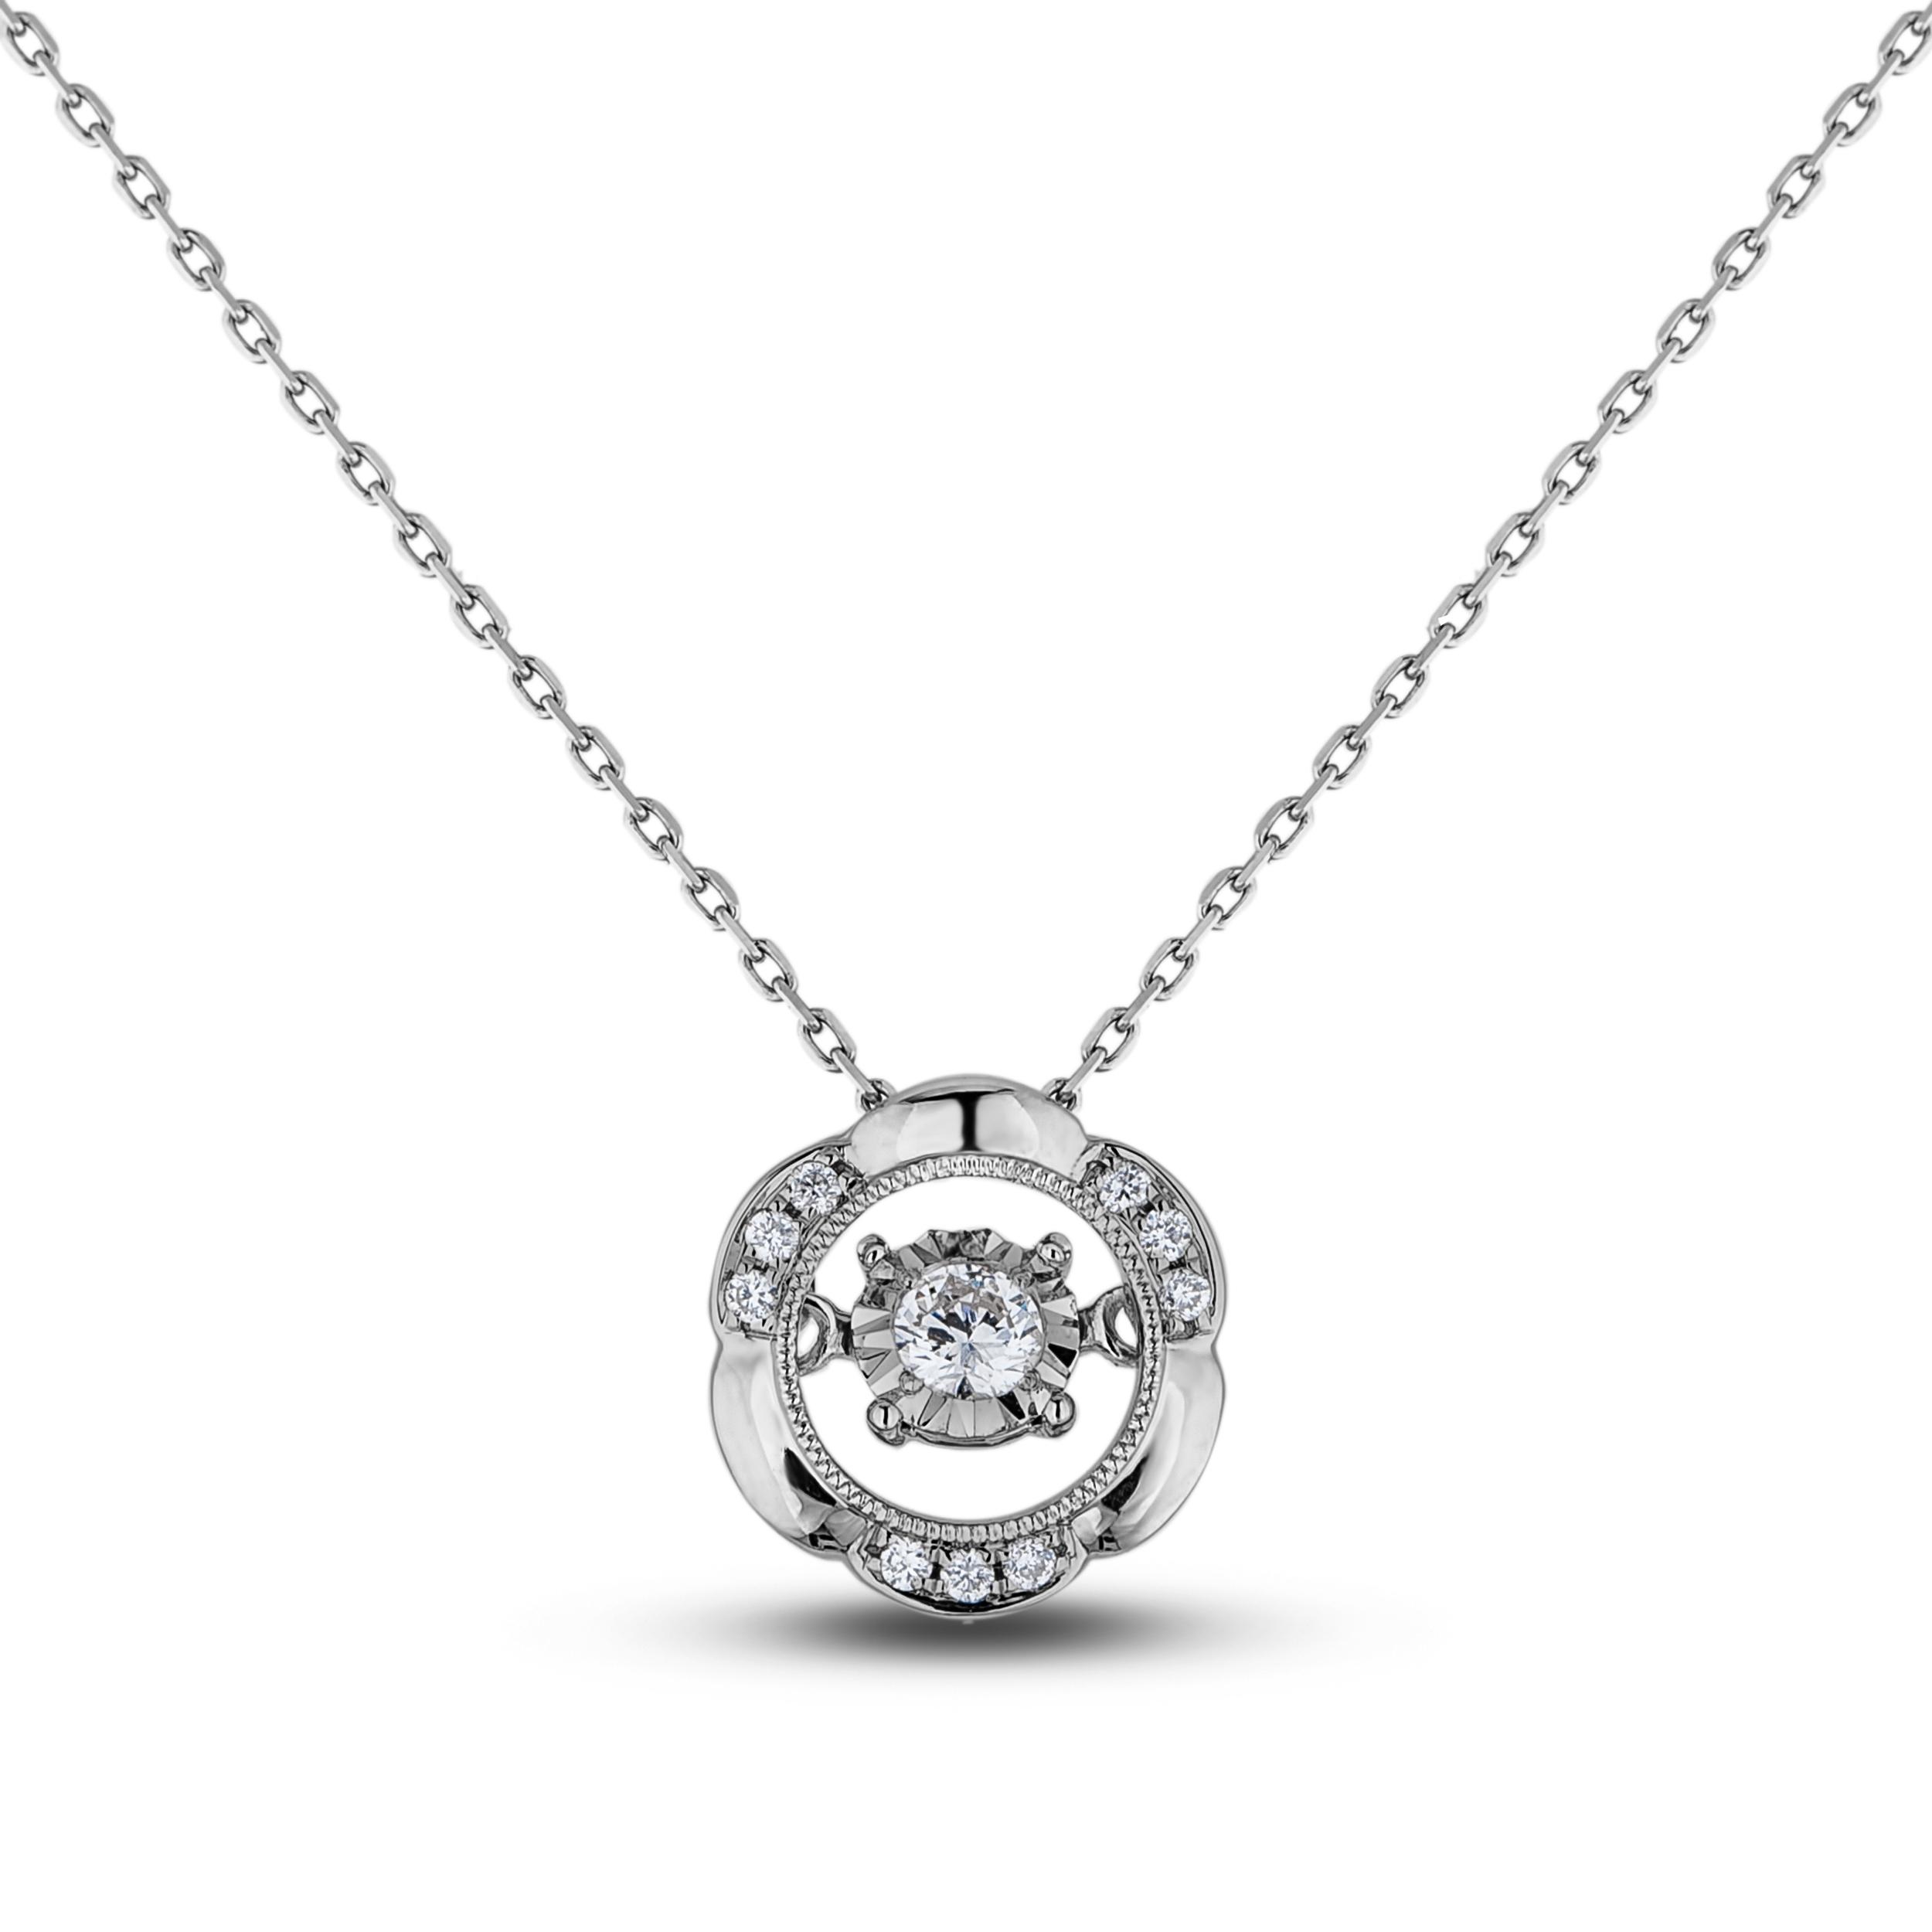 Diamond Pendants AFCP1988008RA (Pendants)